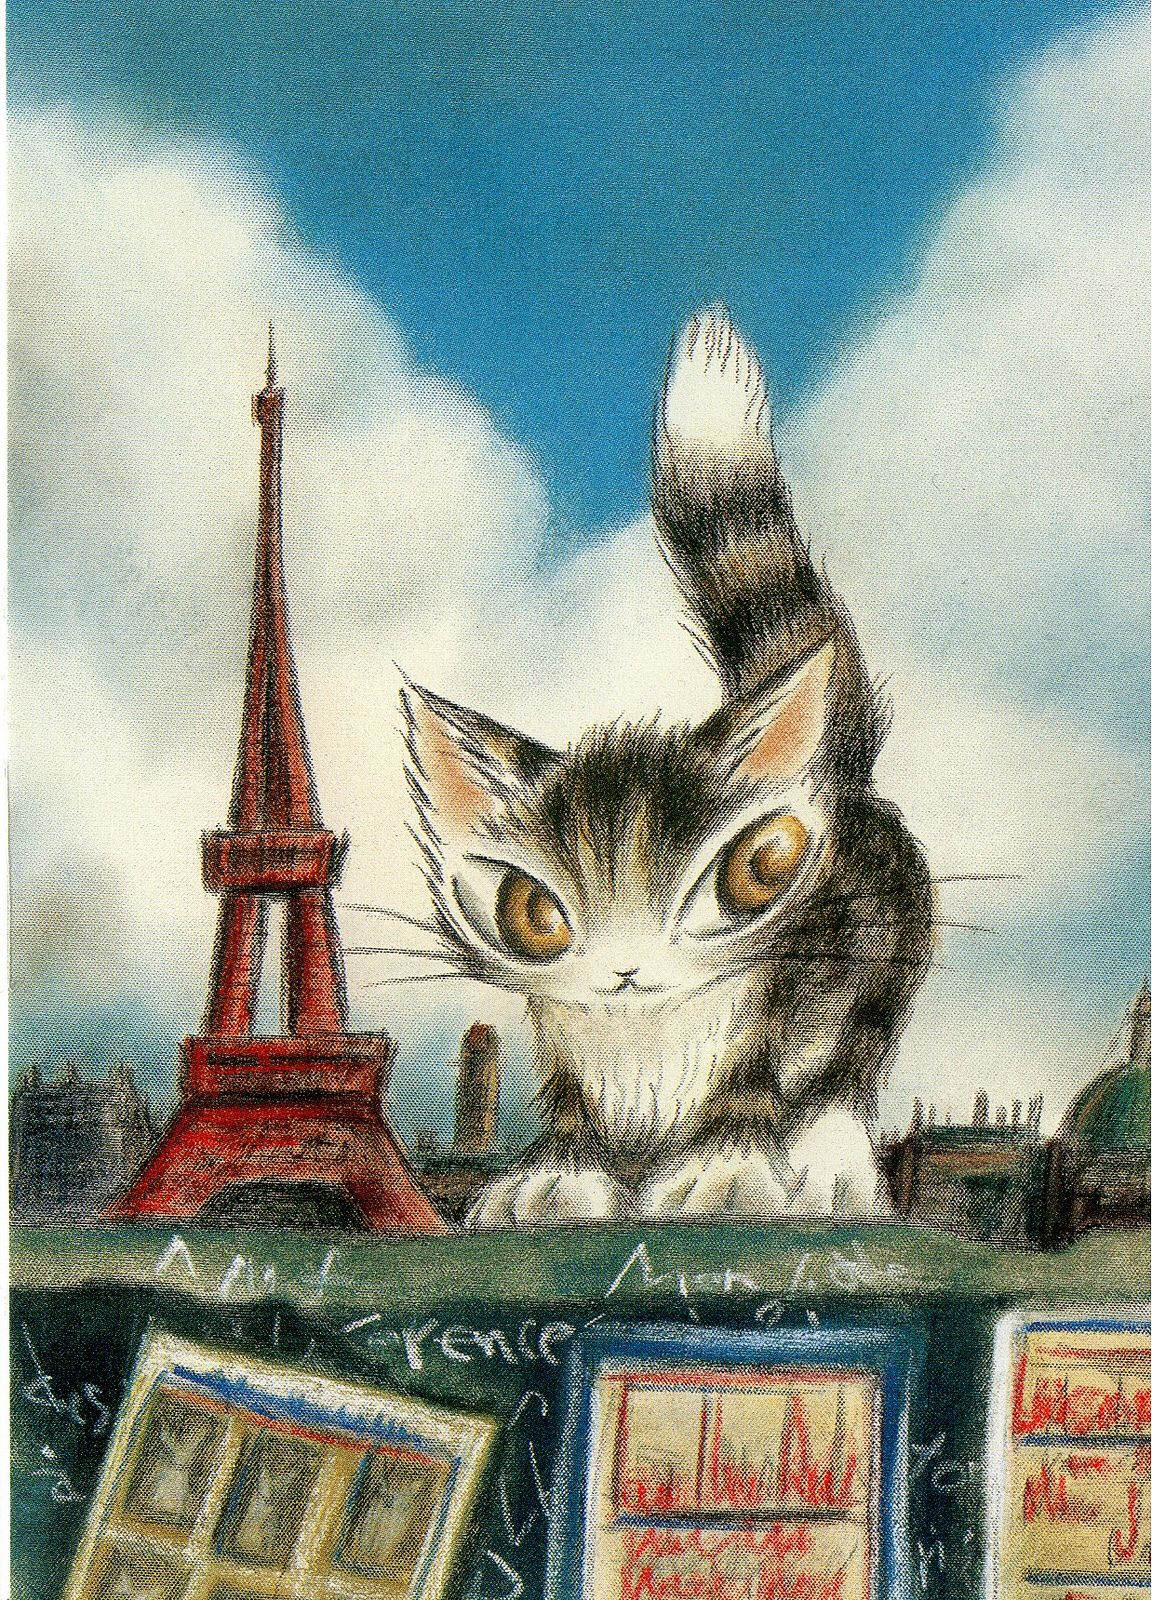 Wachifield 猫 絵 猫のイラスト ネコ イラスト